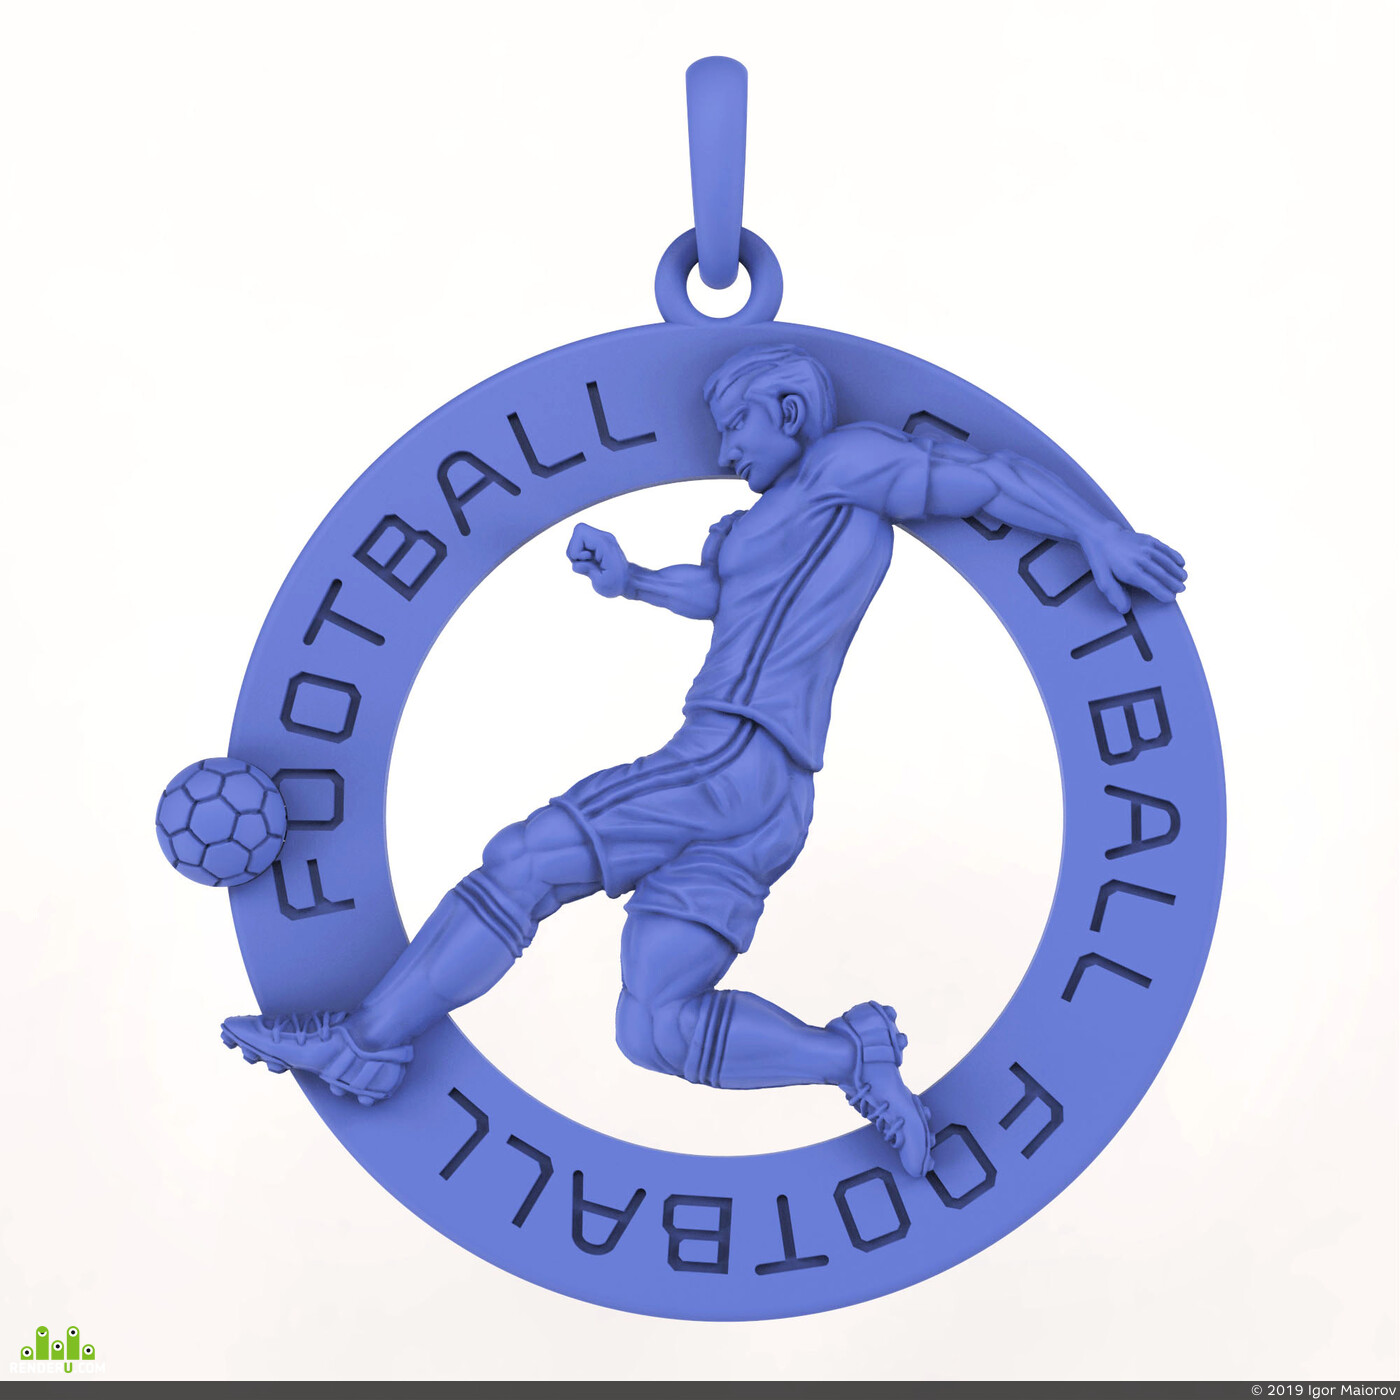 jewel, jewelry, pendant footbal, cnc modeling, jewelry 3d, jewelry modeling, footbal jewelry, sport jewelry, Подвеска футбол, soccer jewelry